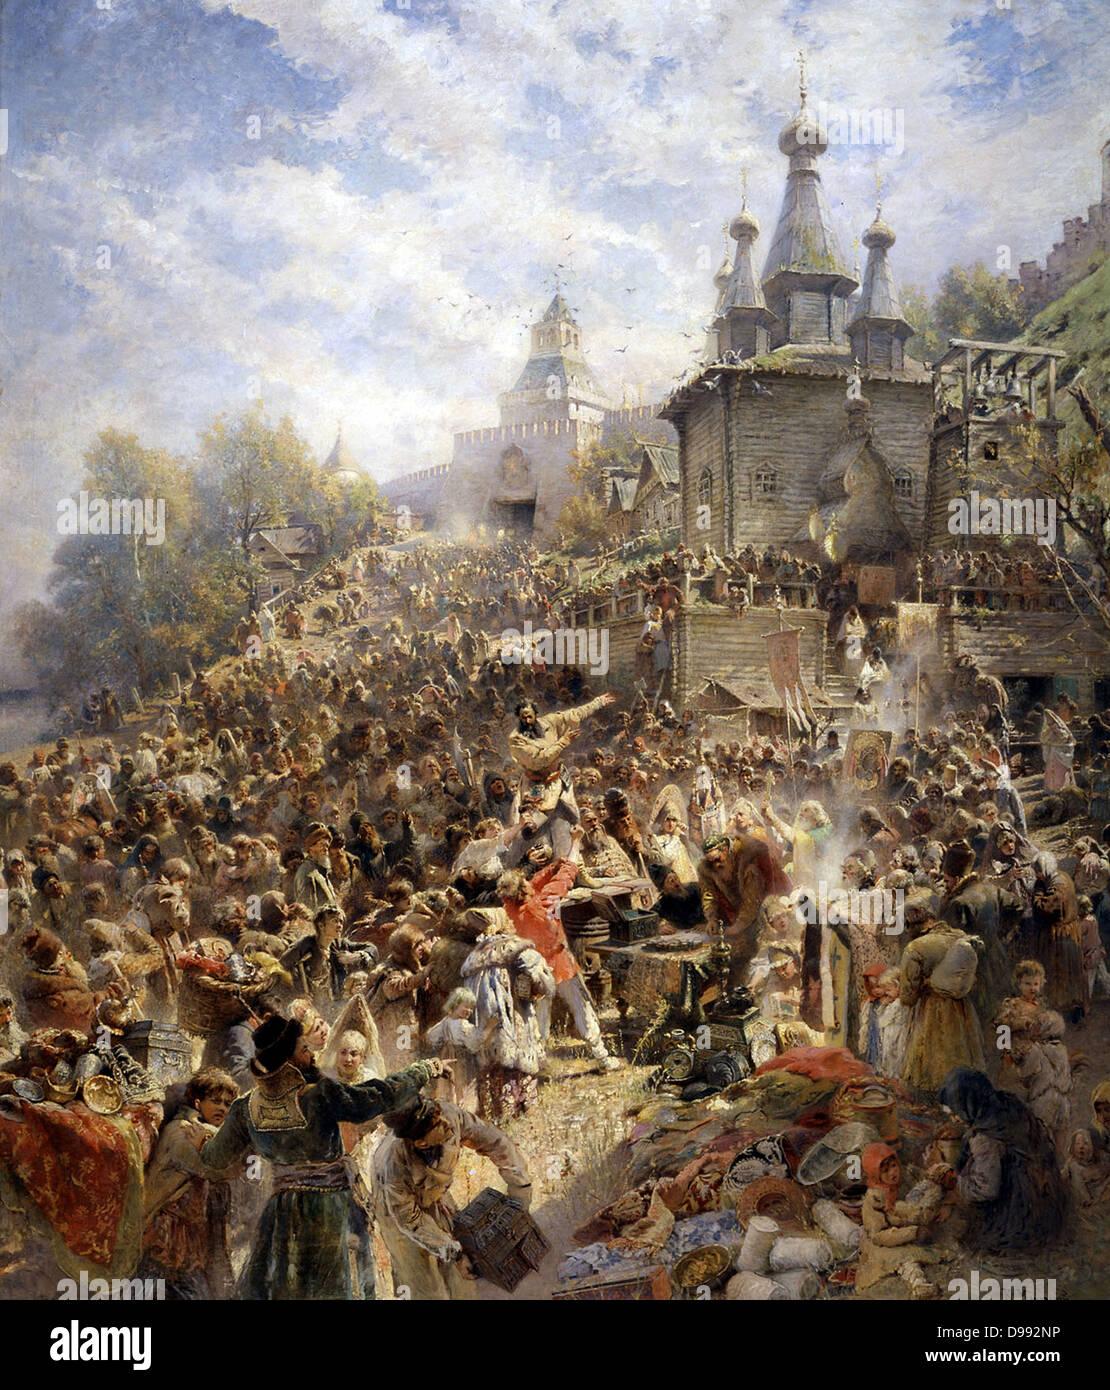 Minin's Appeal', 1896. Oil on canvas. Konstantin Makovsky (1839–1915) Russian artist. Kuzma Minin (d1616) - Stock Image